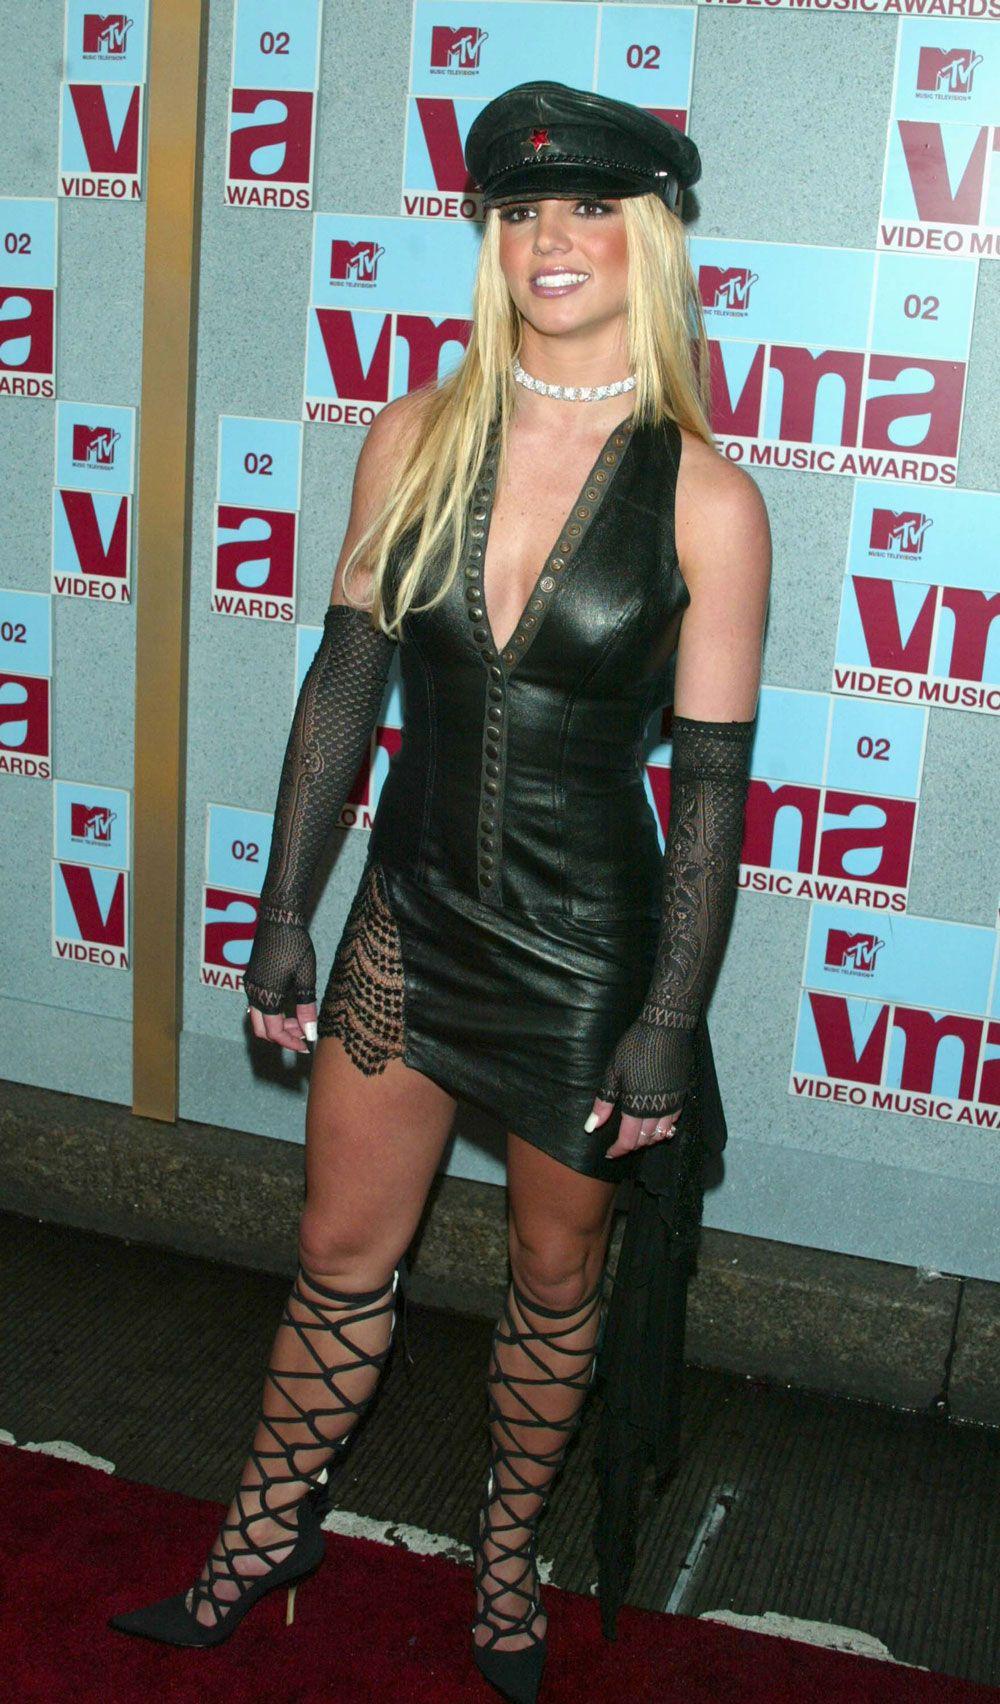 Britney Spears 2002 MTV Video Awards